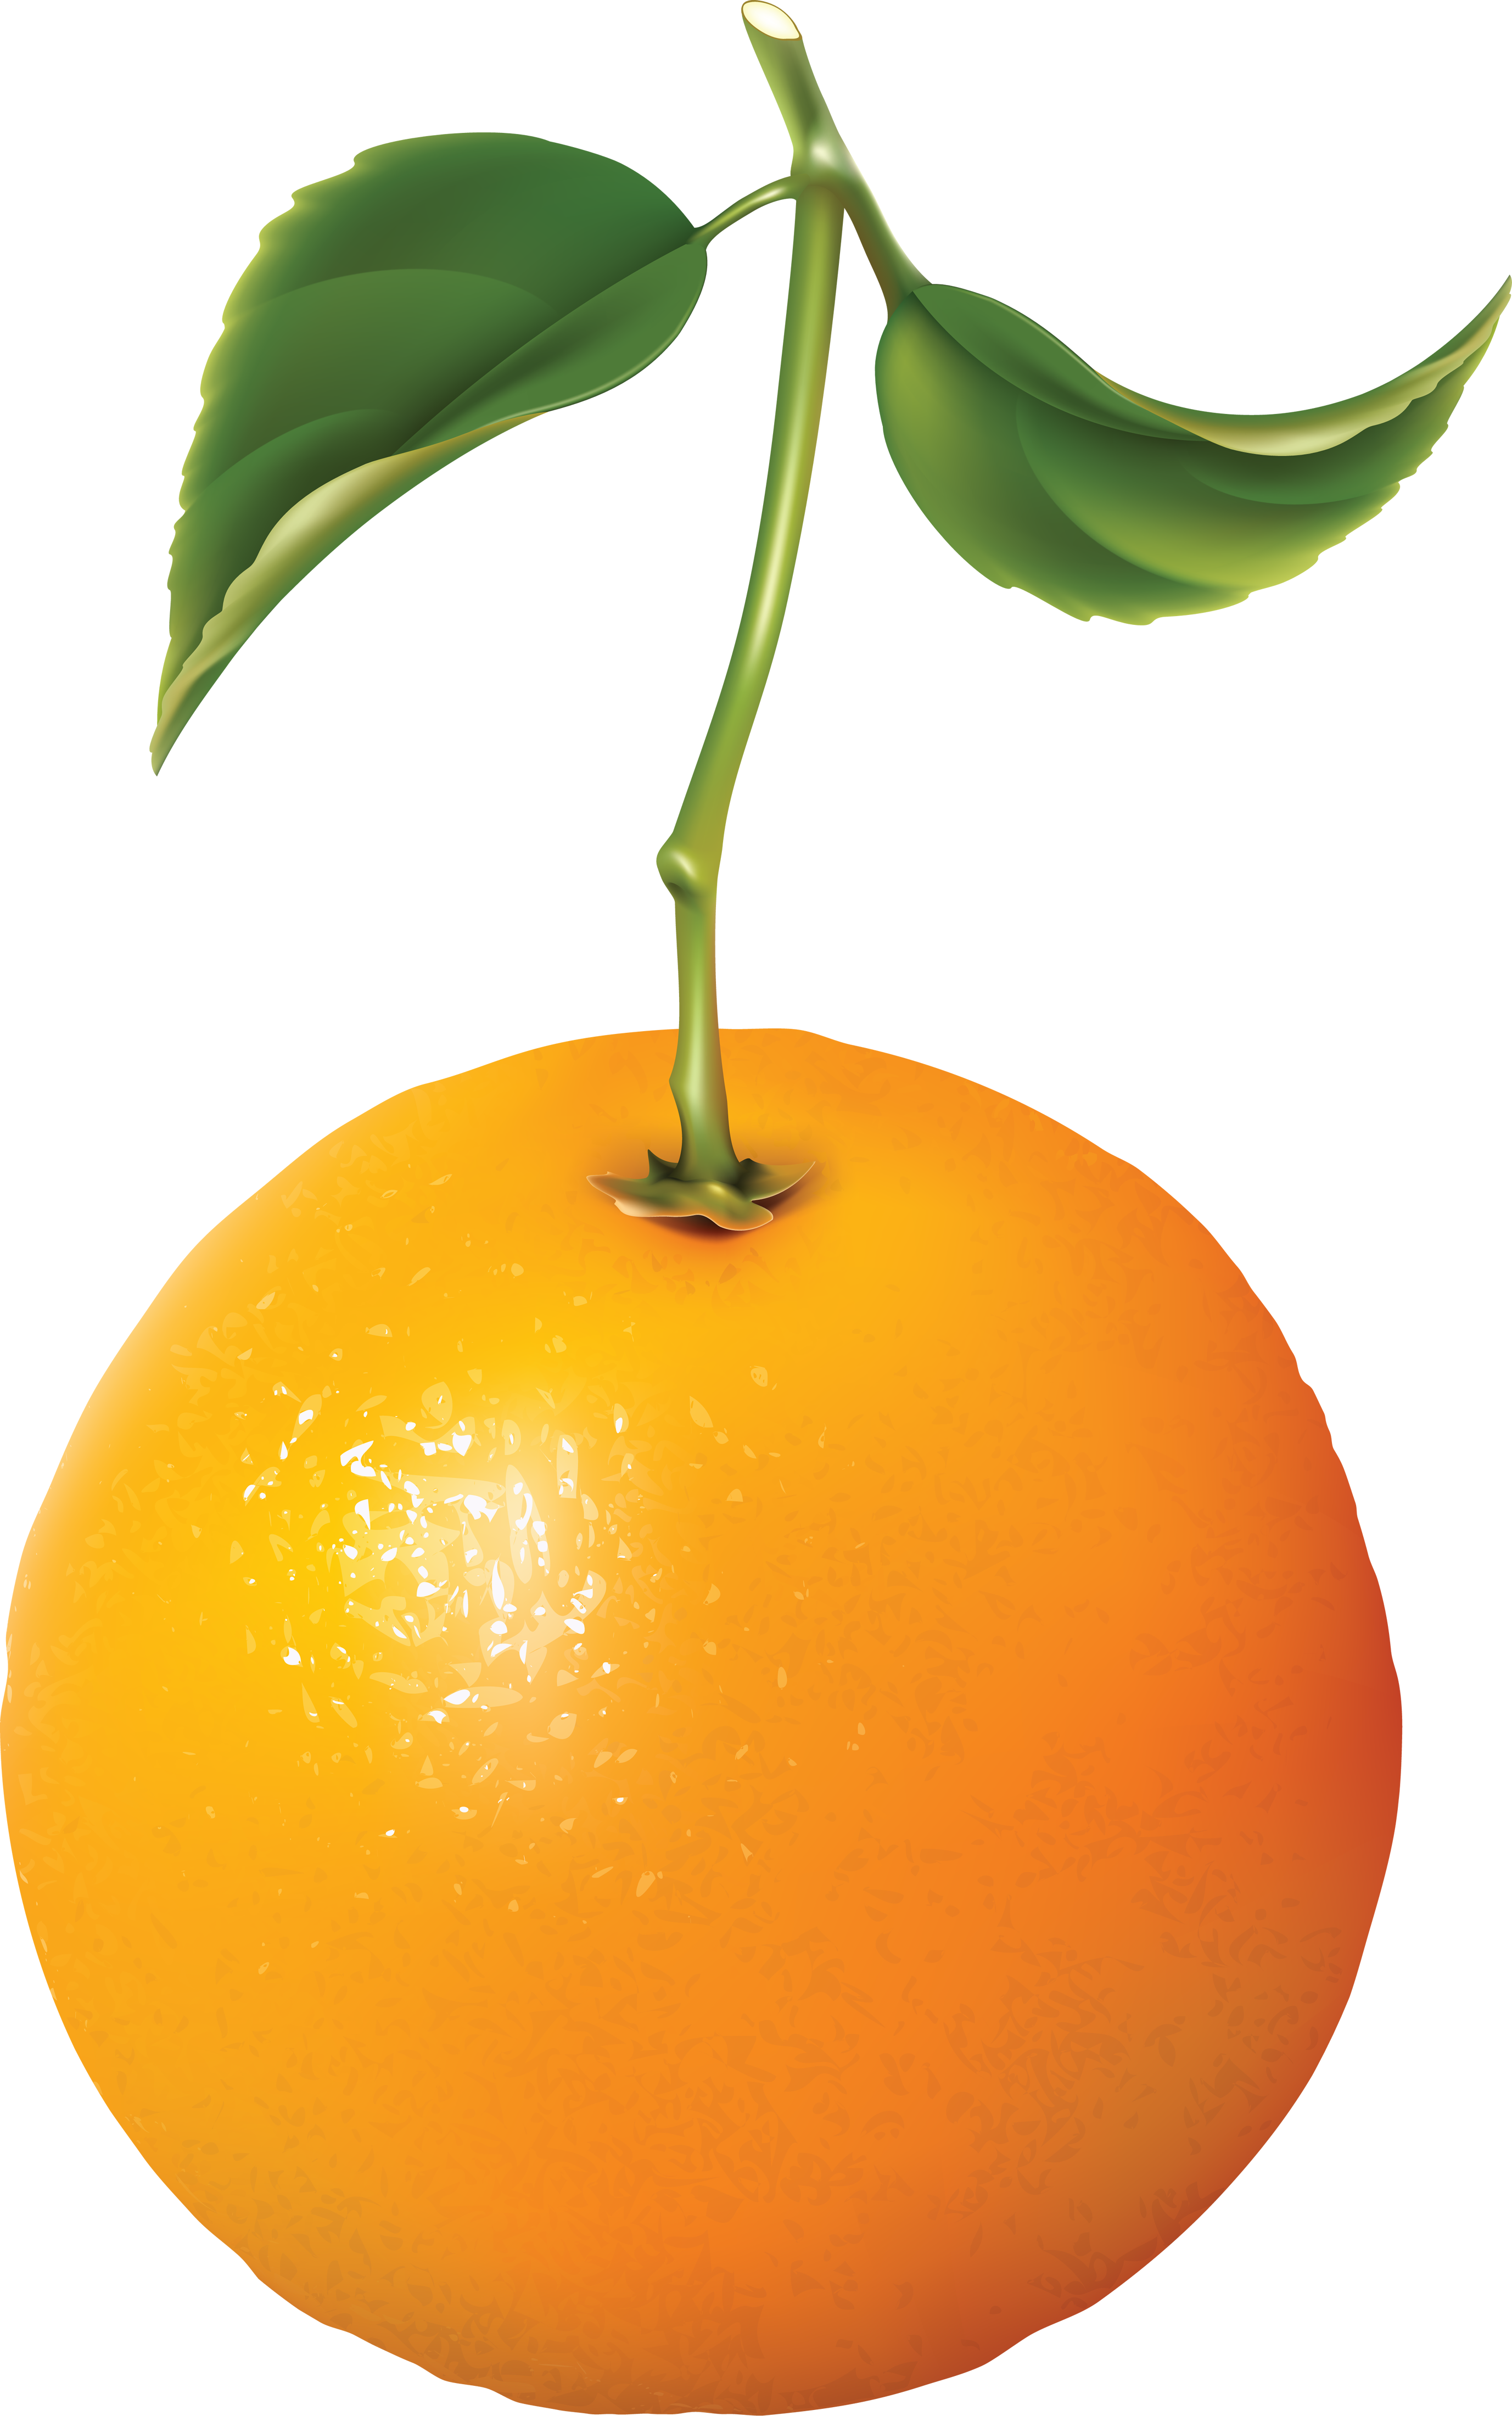 Orange Oranges Png Image Orange Oranges Vegetable Drawing